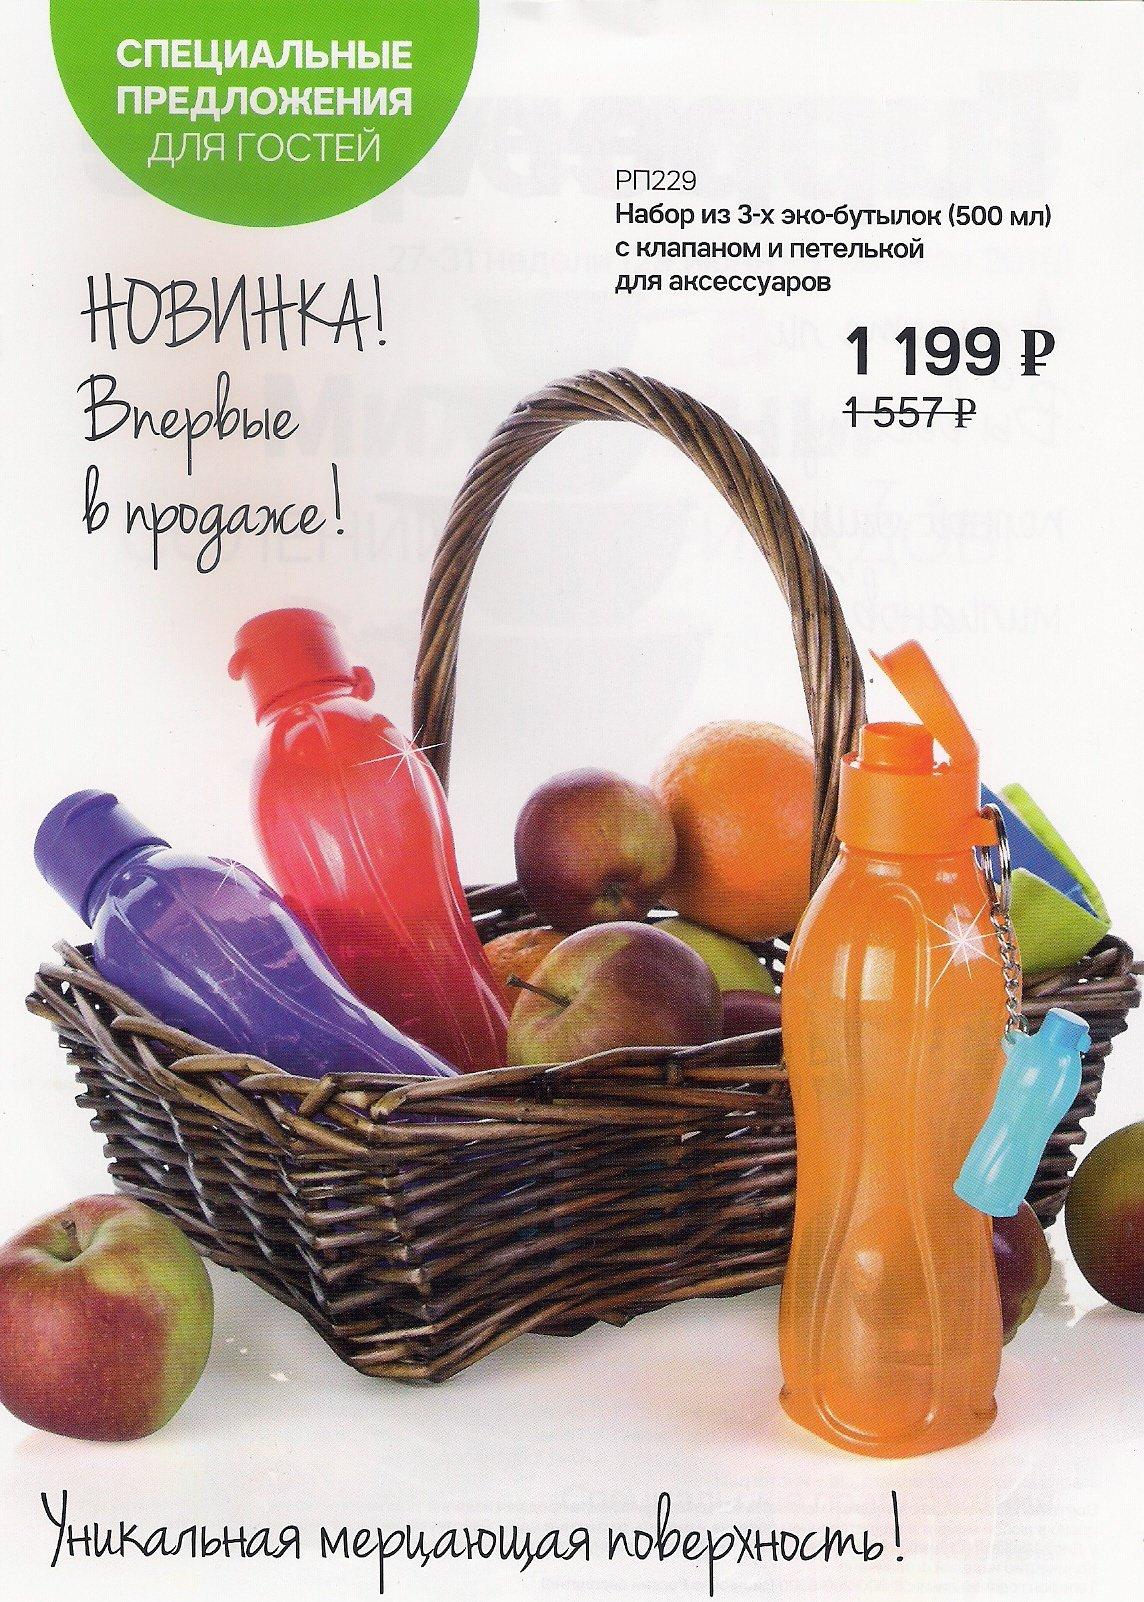 http://tupperware-online.ru/images/upload/22a.jpg